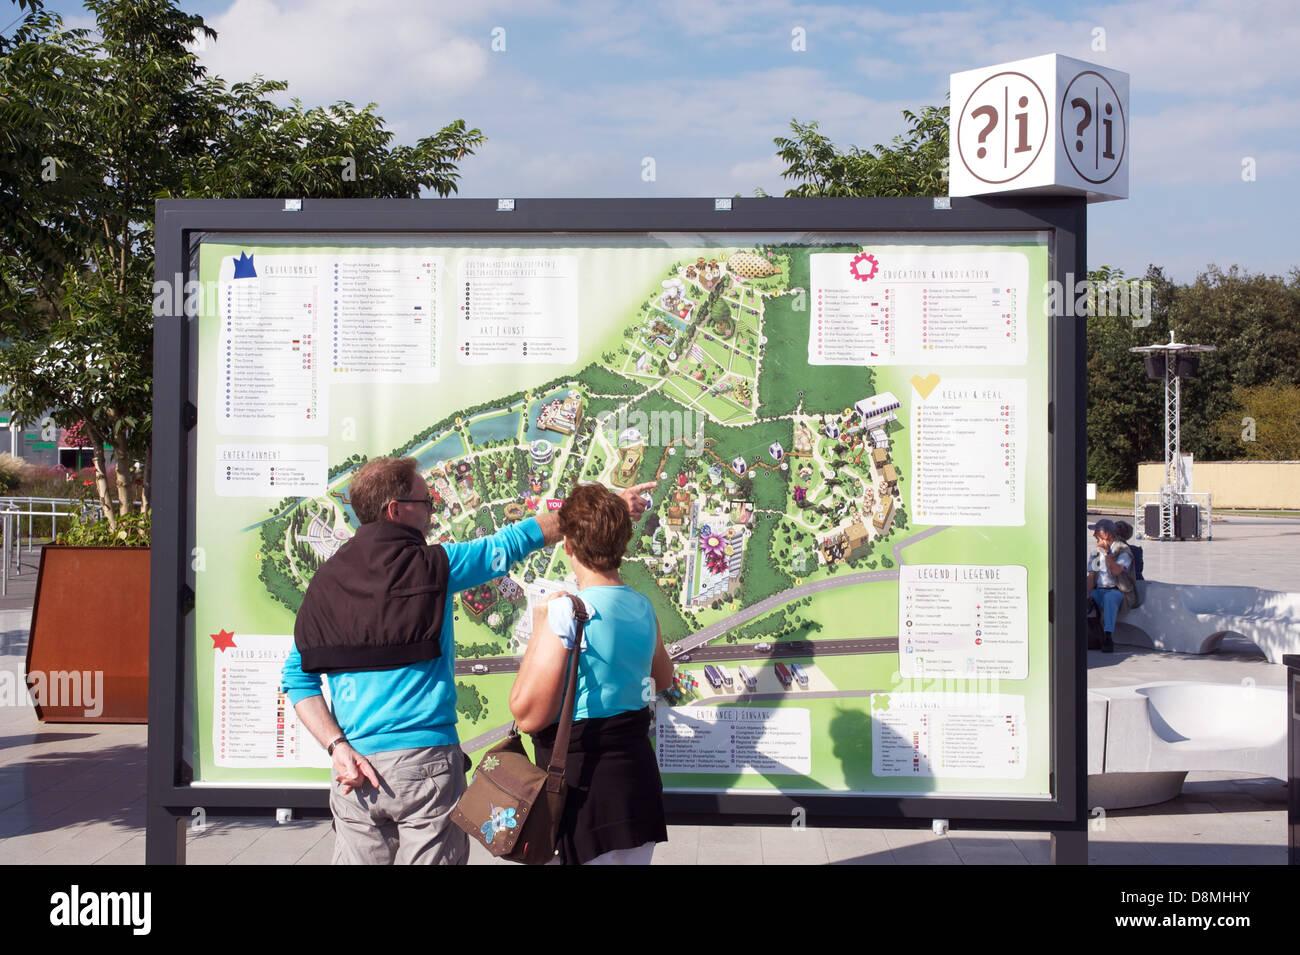 Giant map of the Floriade 2012 garden festival Venlo, Netherlands. - Stock Image